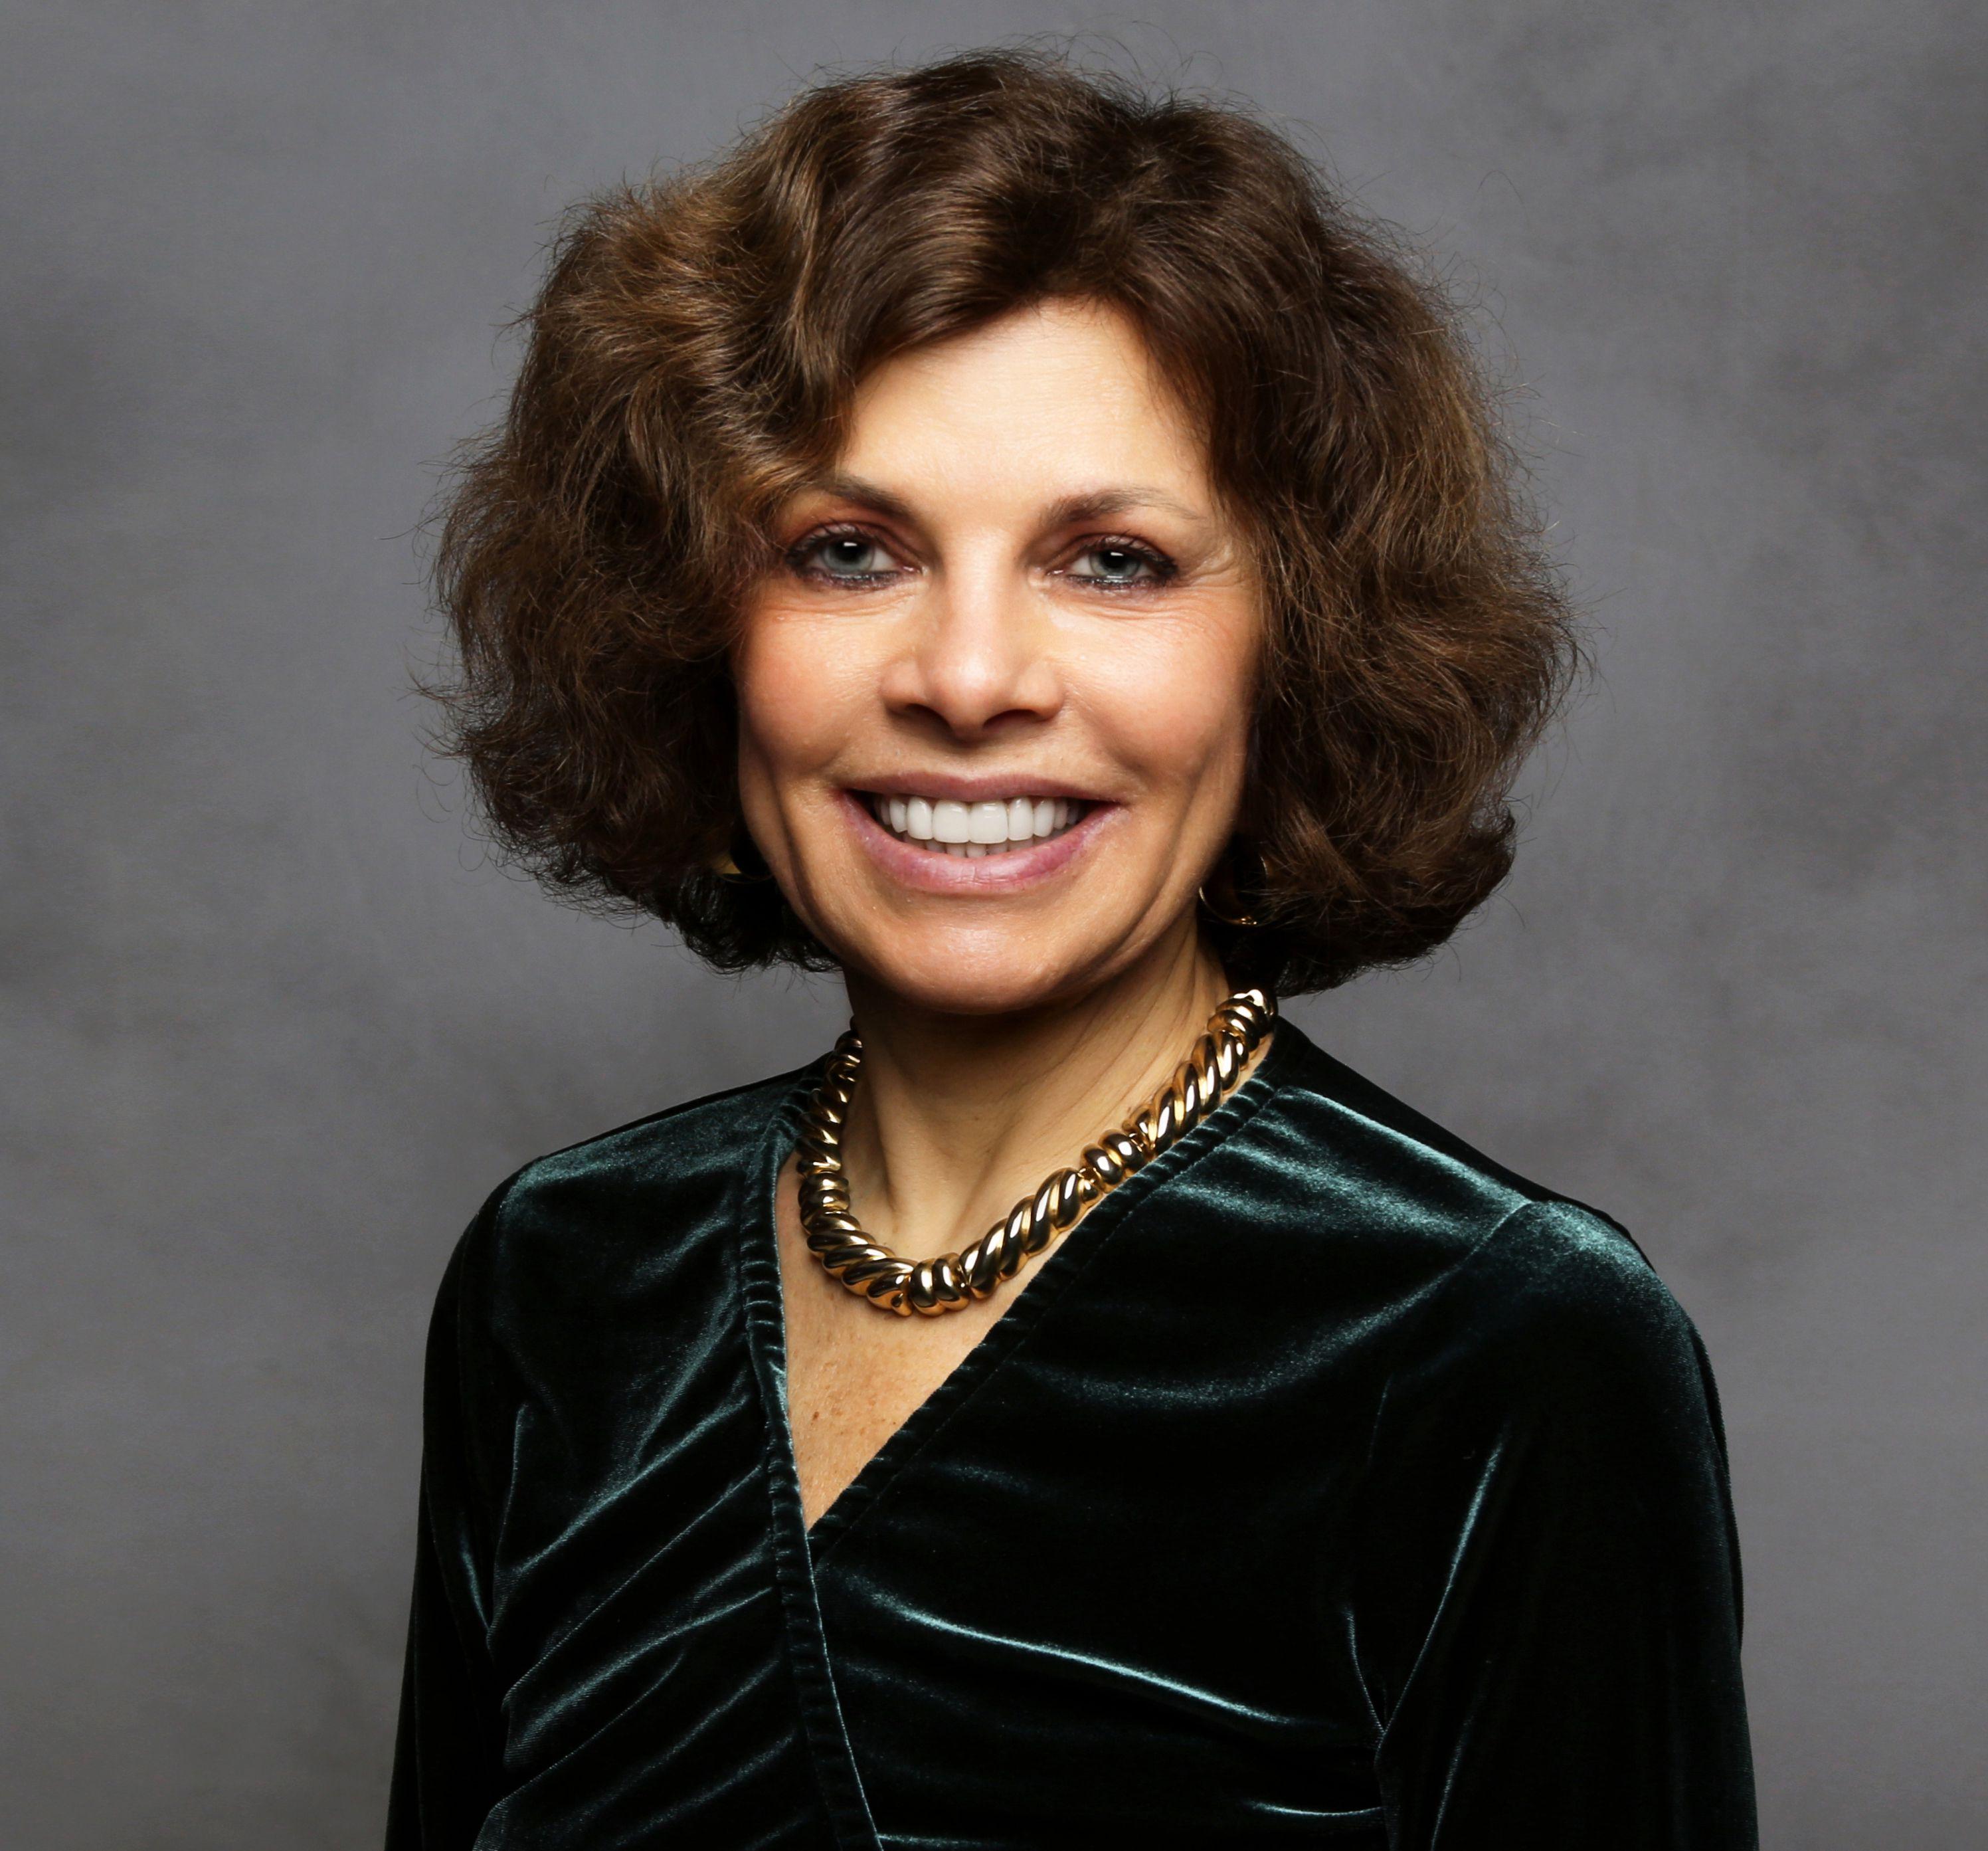 Nadine Strossen, American Lawyer. President Of The